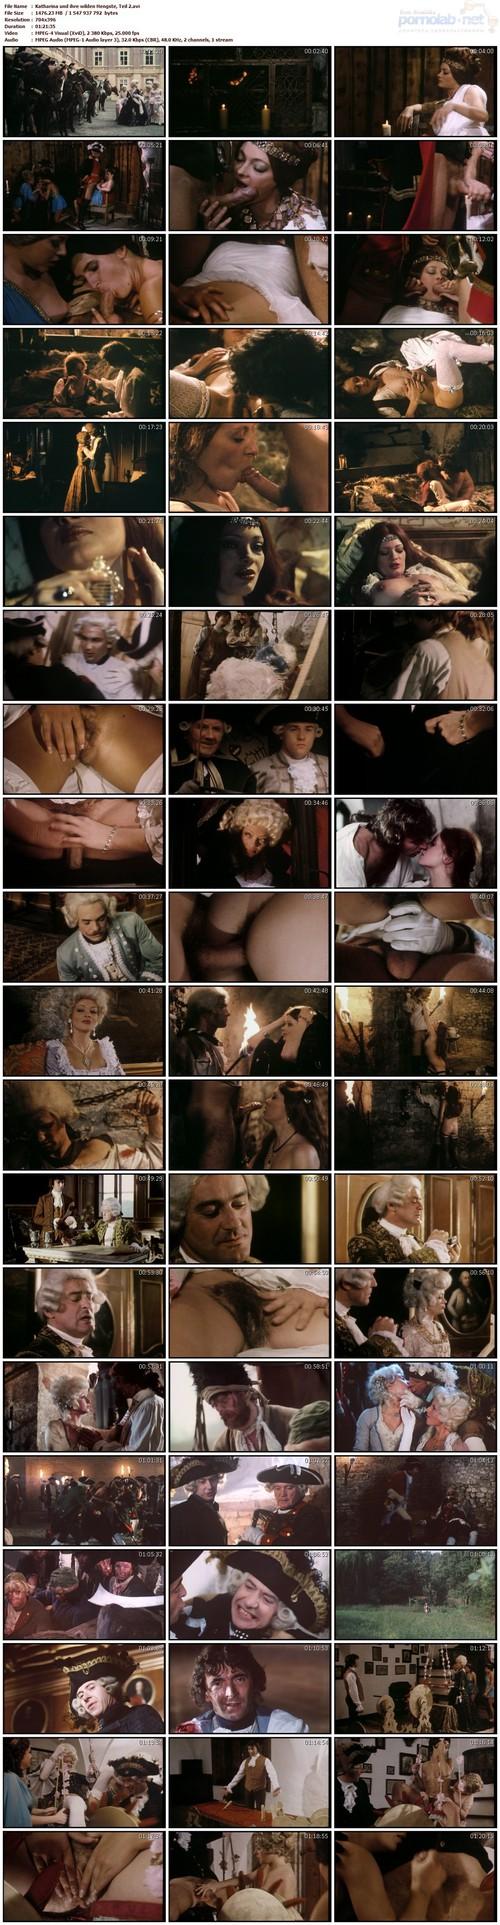 esli-porno-ekaterina-2-aya